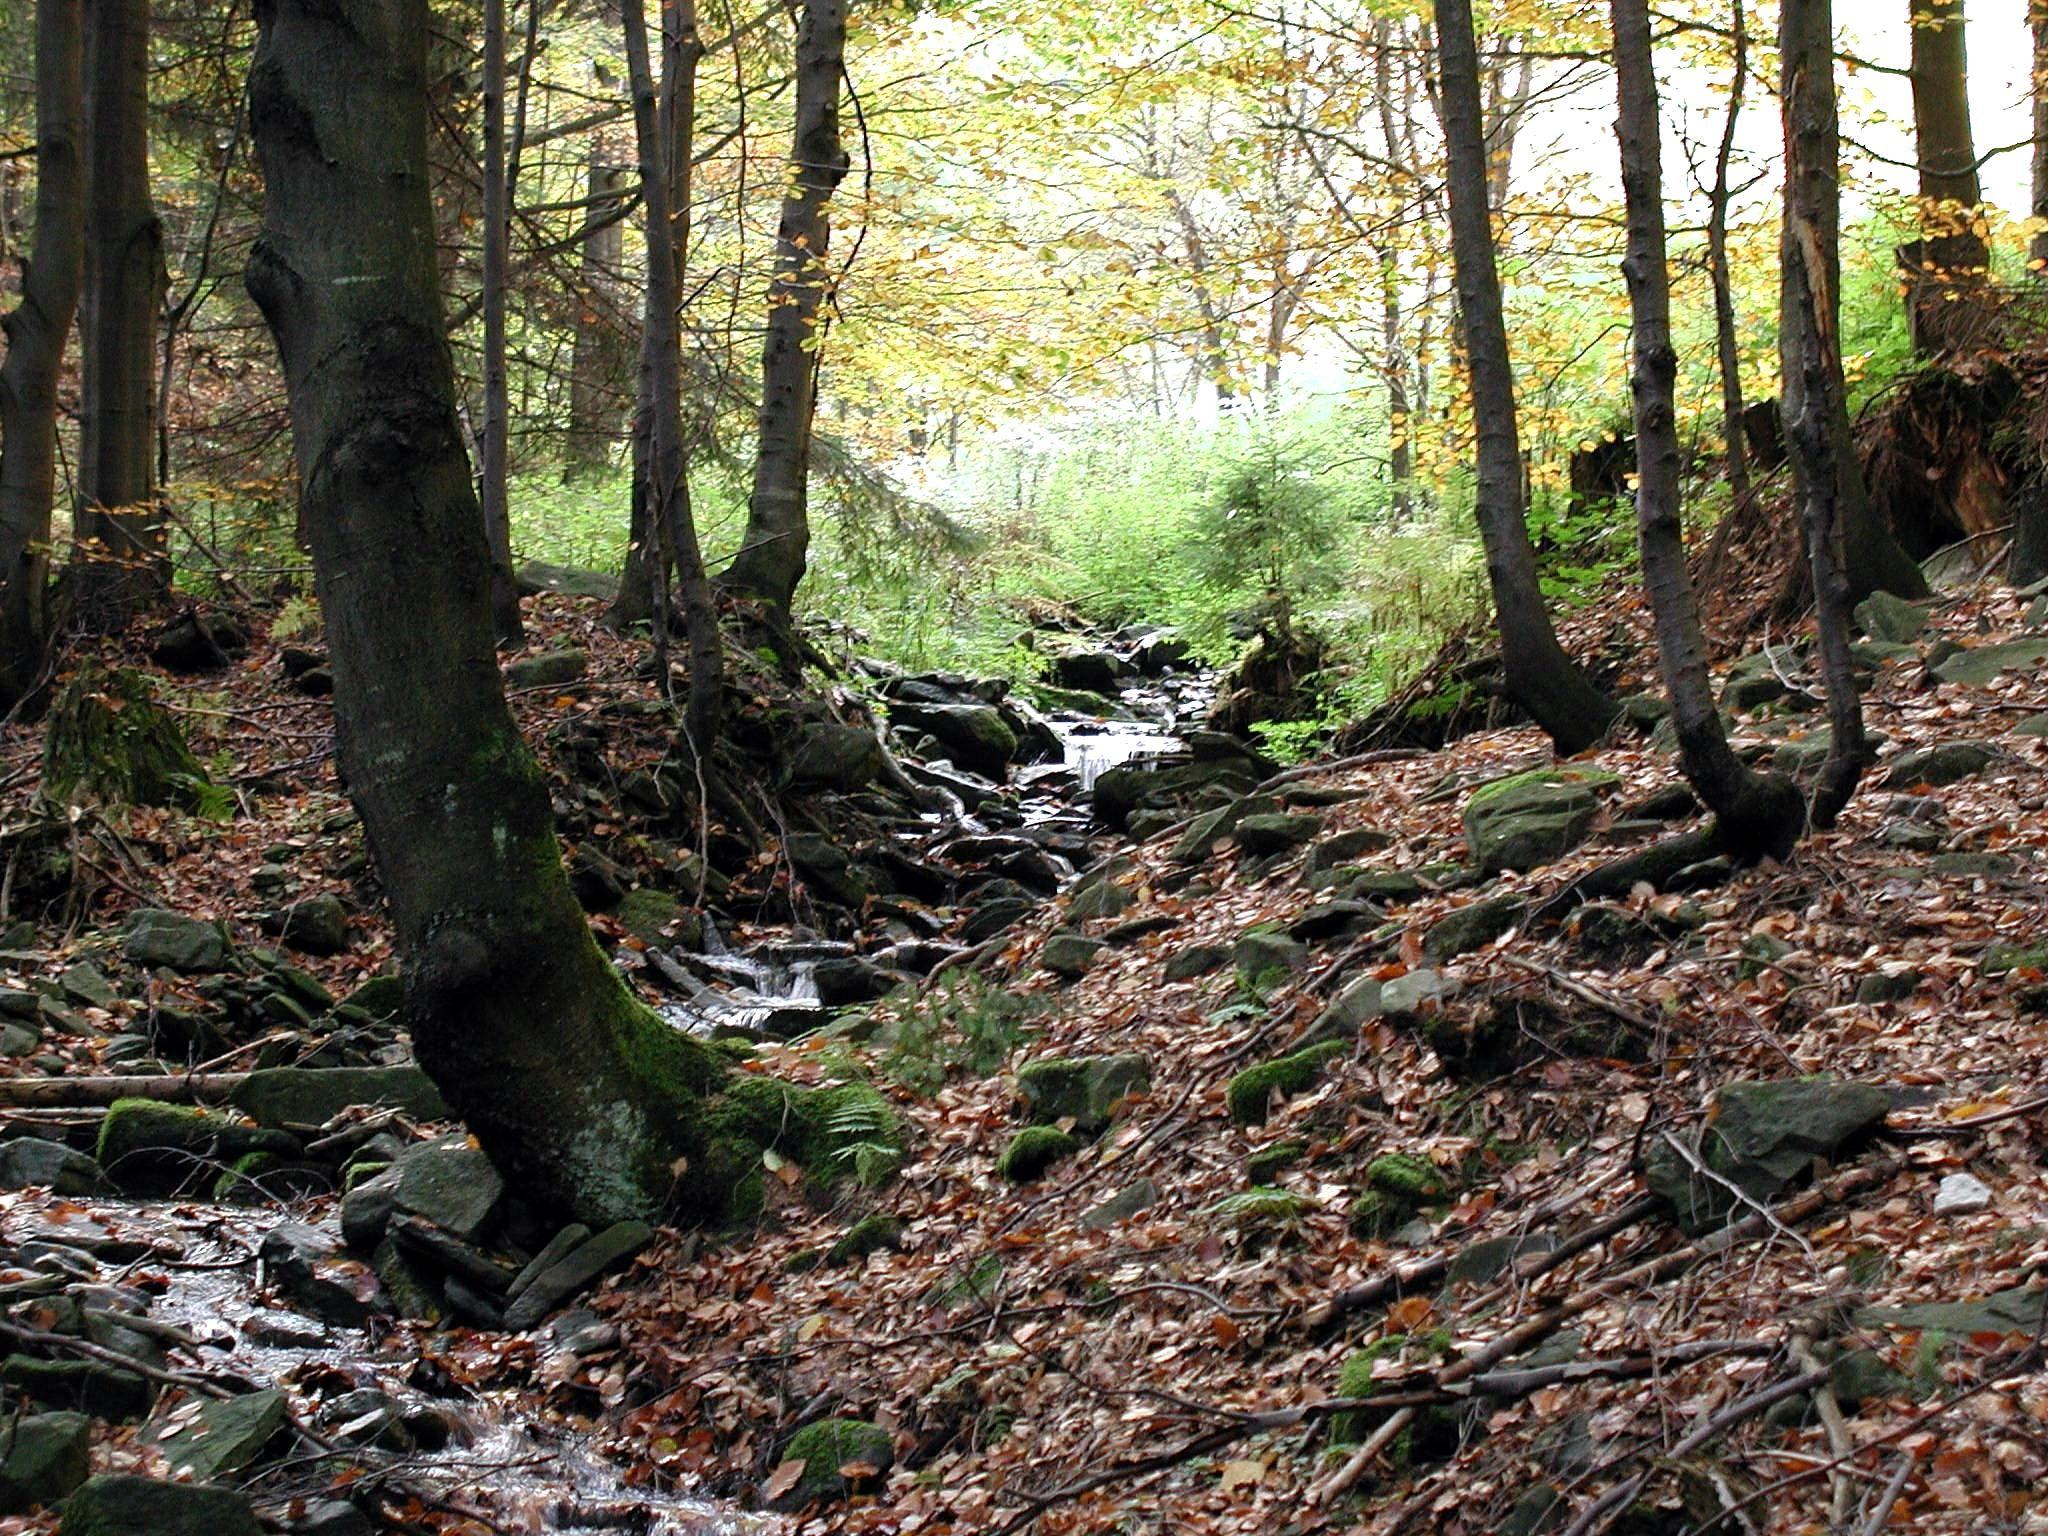 File:Forest Habitat.jpg - Wikimedia Commons